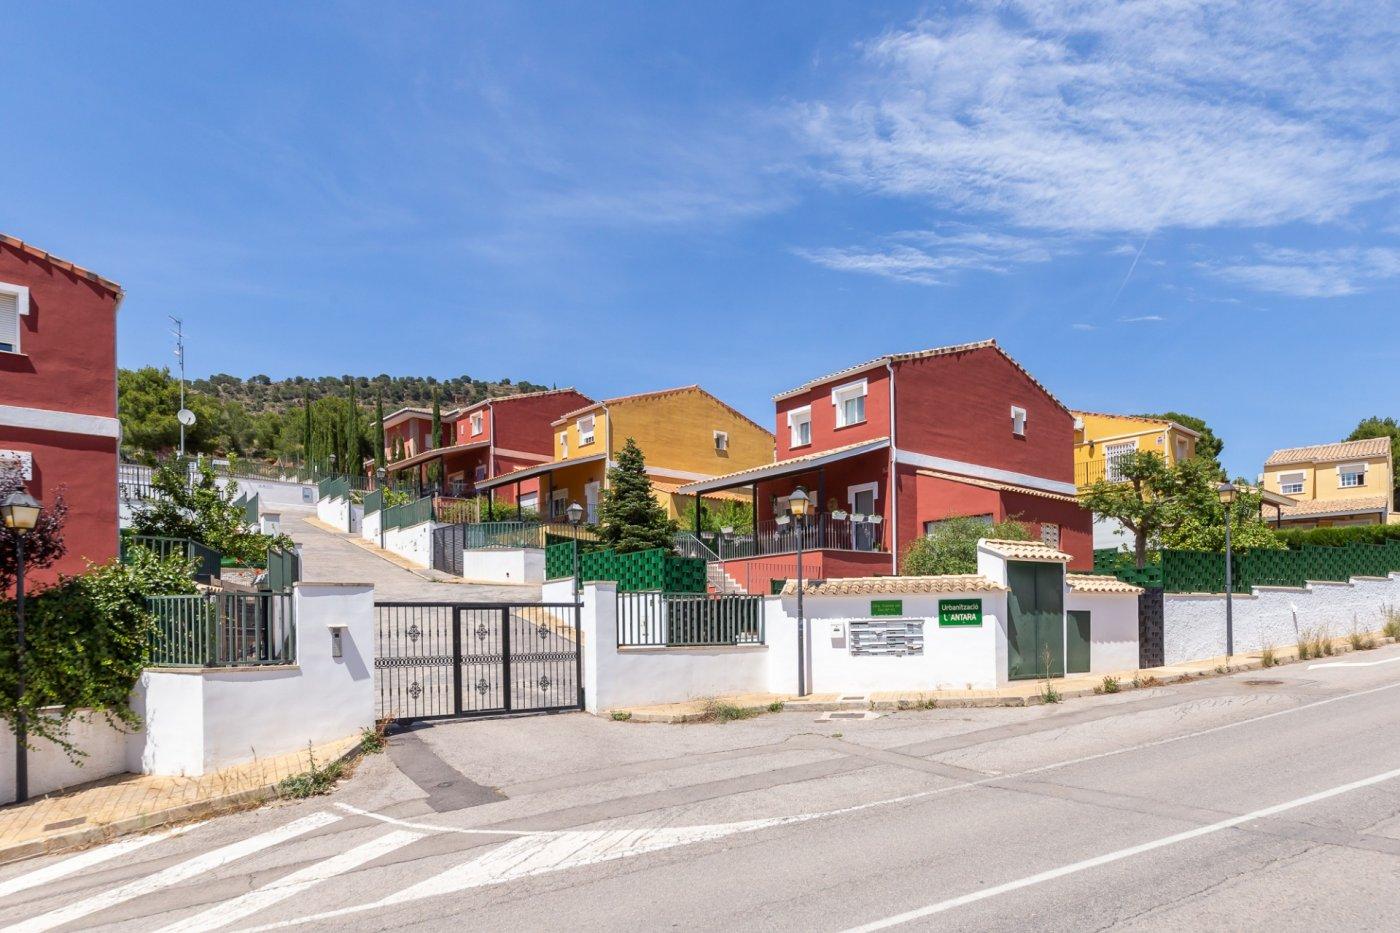 Venta de Chalet en Naquera